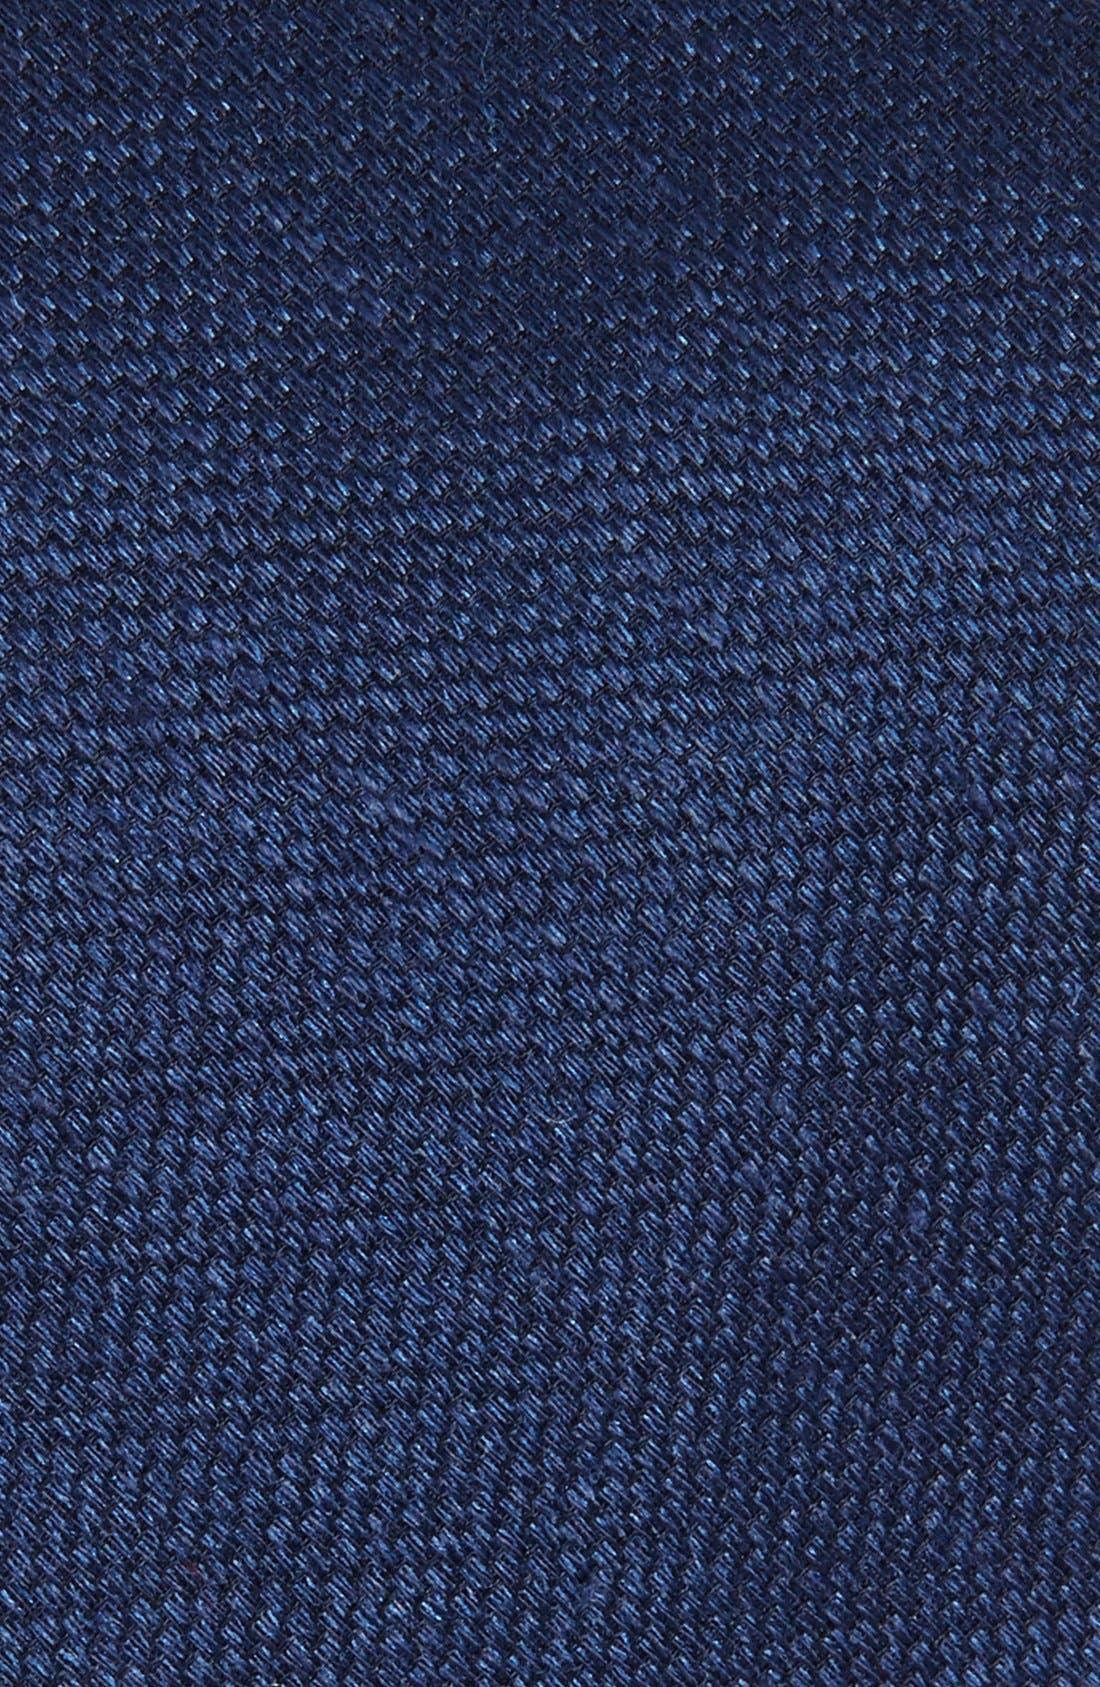 Alternate Image 2  - The Tie Bar Solid Silk & Linen Tie